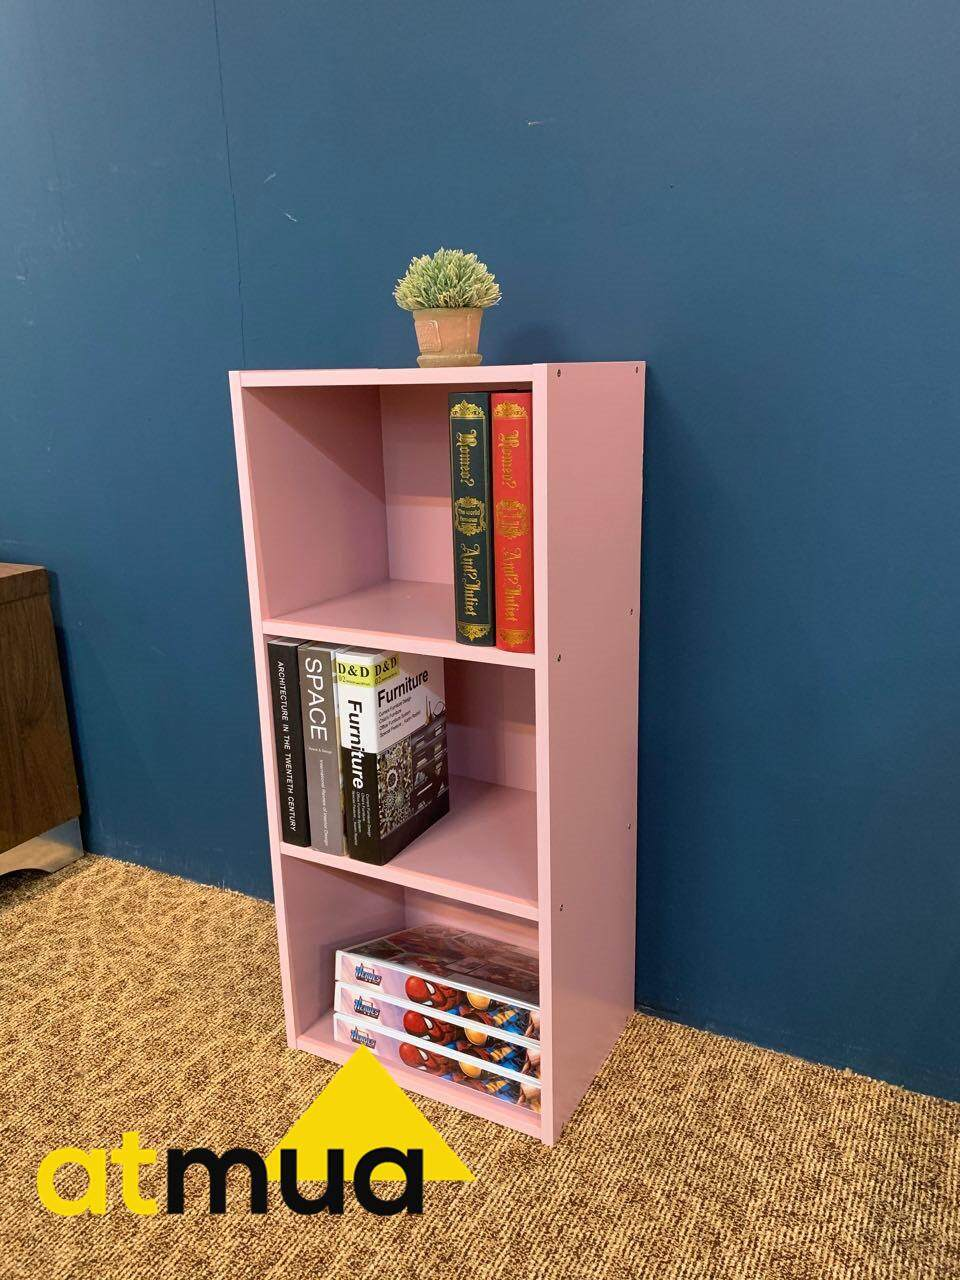 Atmua Big Size 3 Tier Color Box / Utility Shelf / Book Shelf / DIY Multi-Purpose Wooden Solid Board Storage Box 90cm Height Cabinet Book Shelf Space Saving Living Room Bathroom Kitchen Office Indoor & Outdoor Use